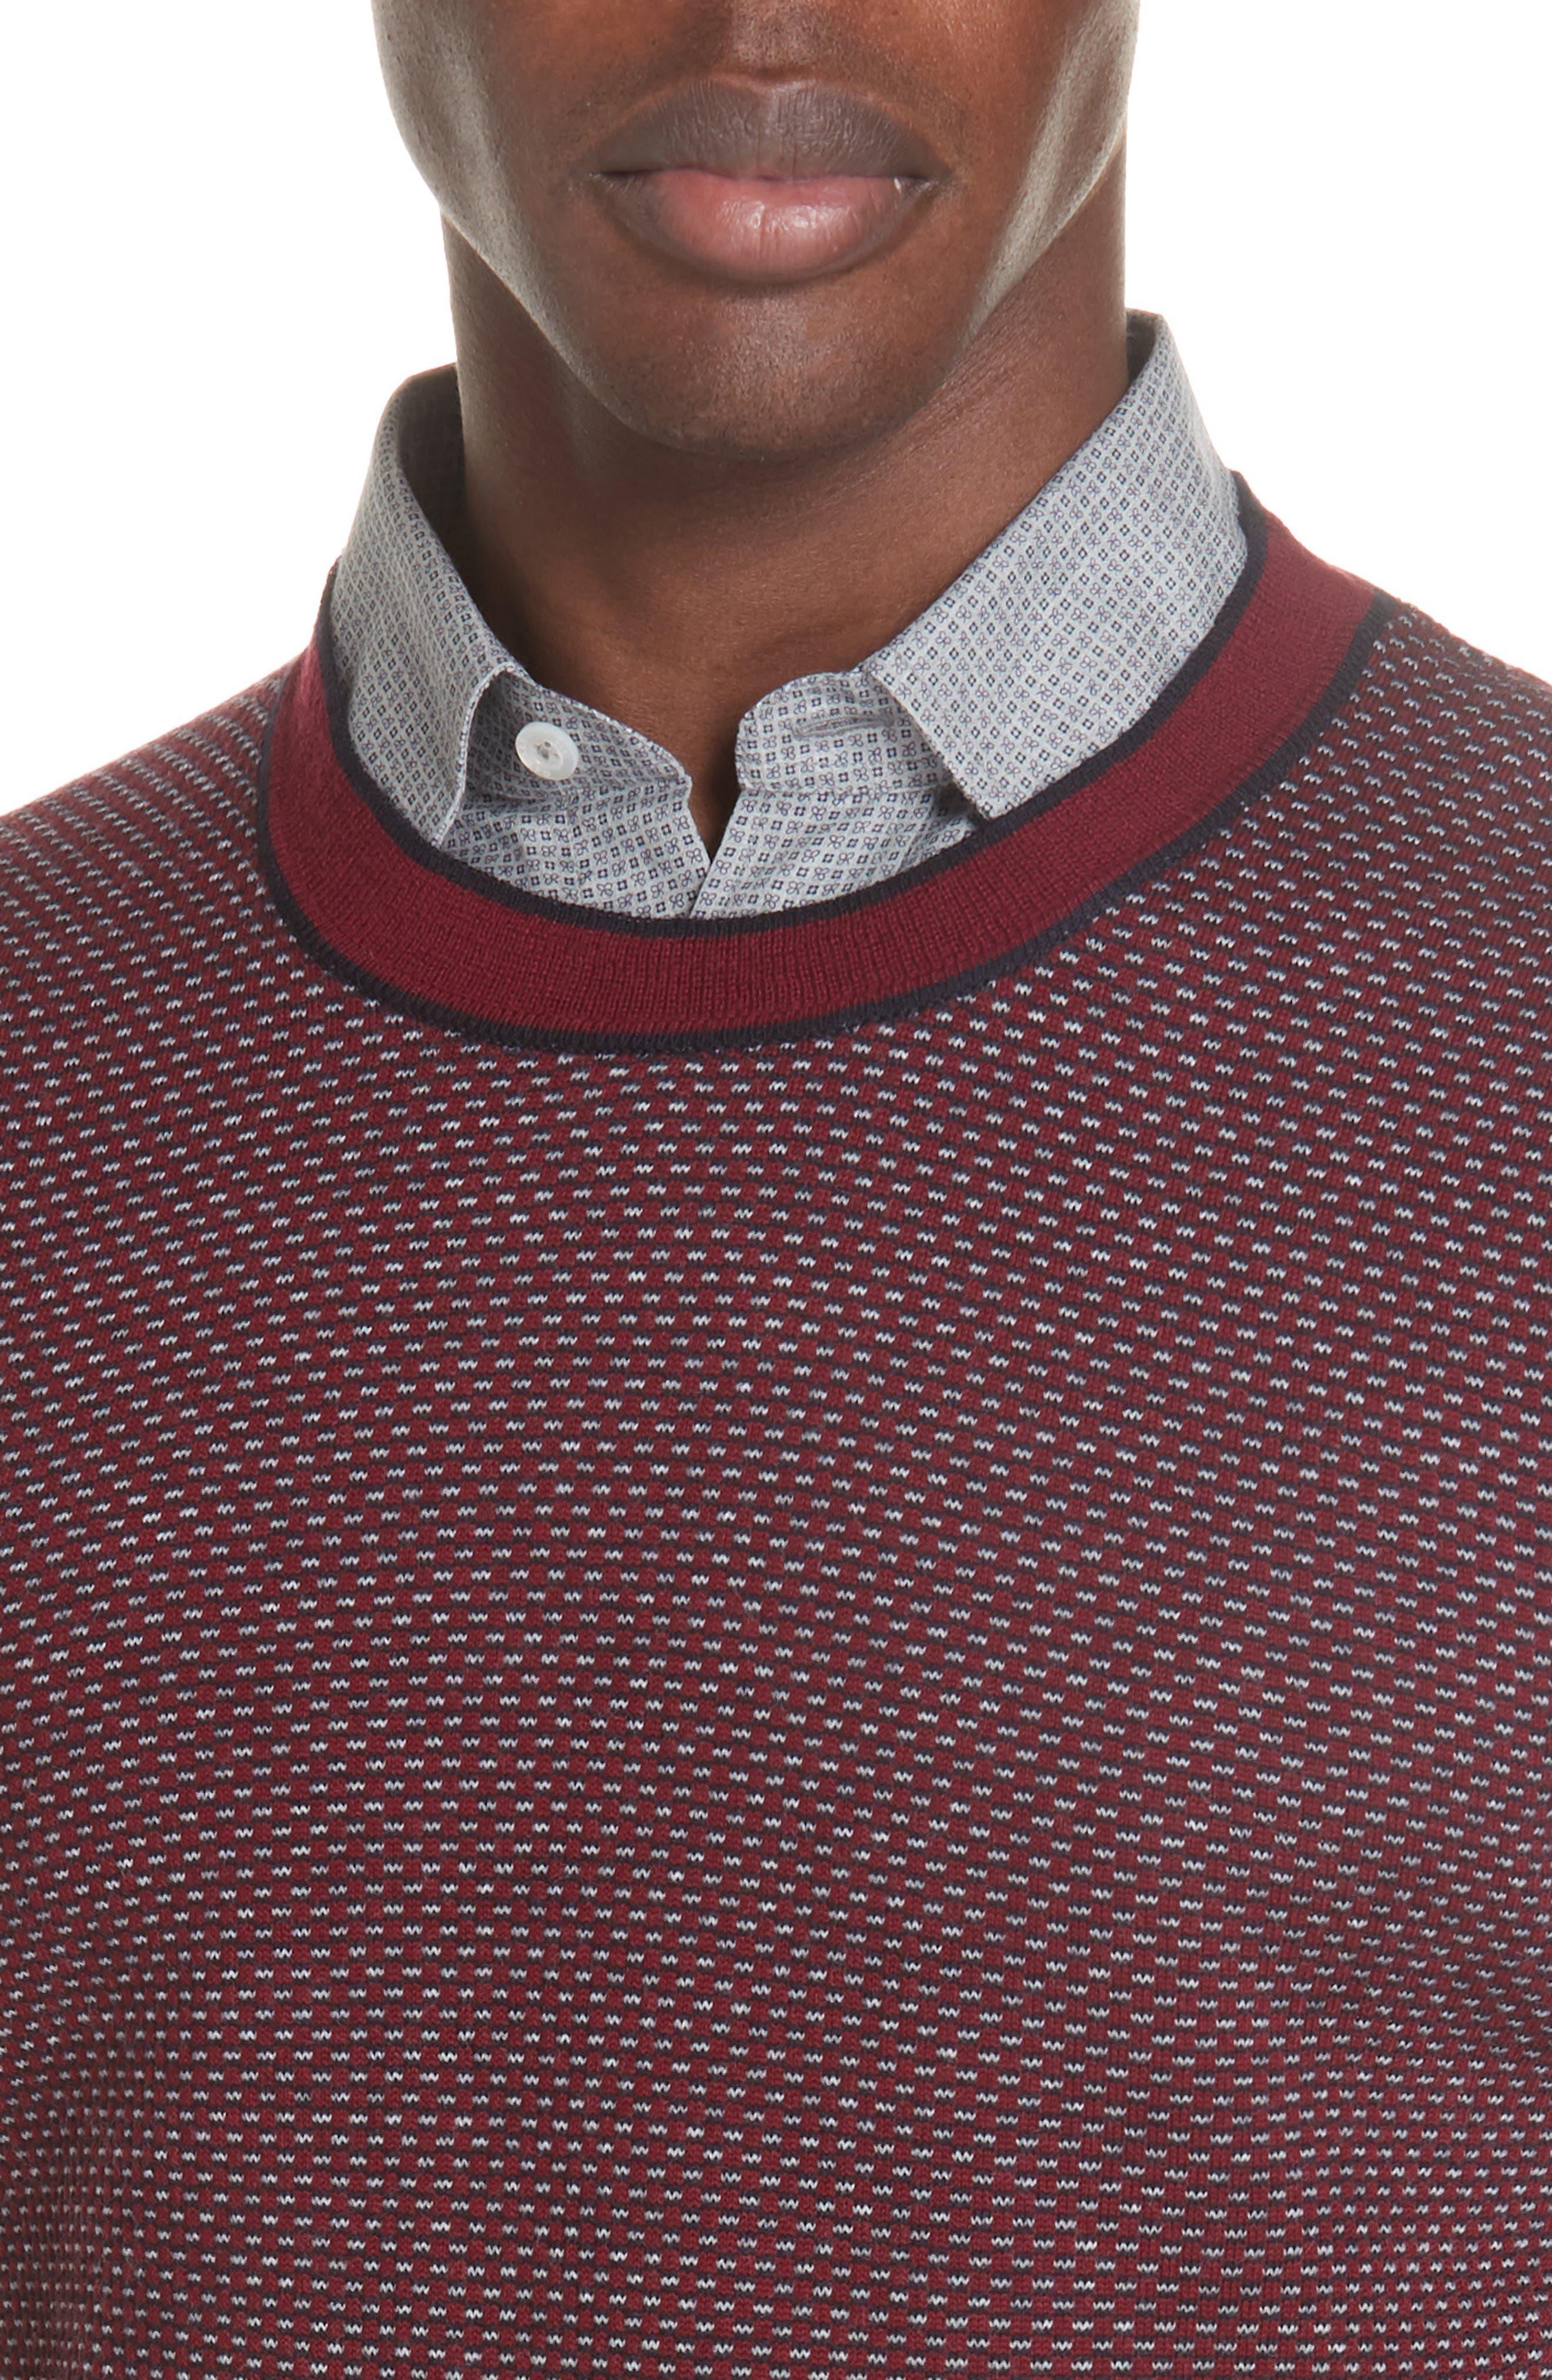 Crewneck Wool Sweater,                             Alternate thumbnail 4, color,                             600